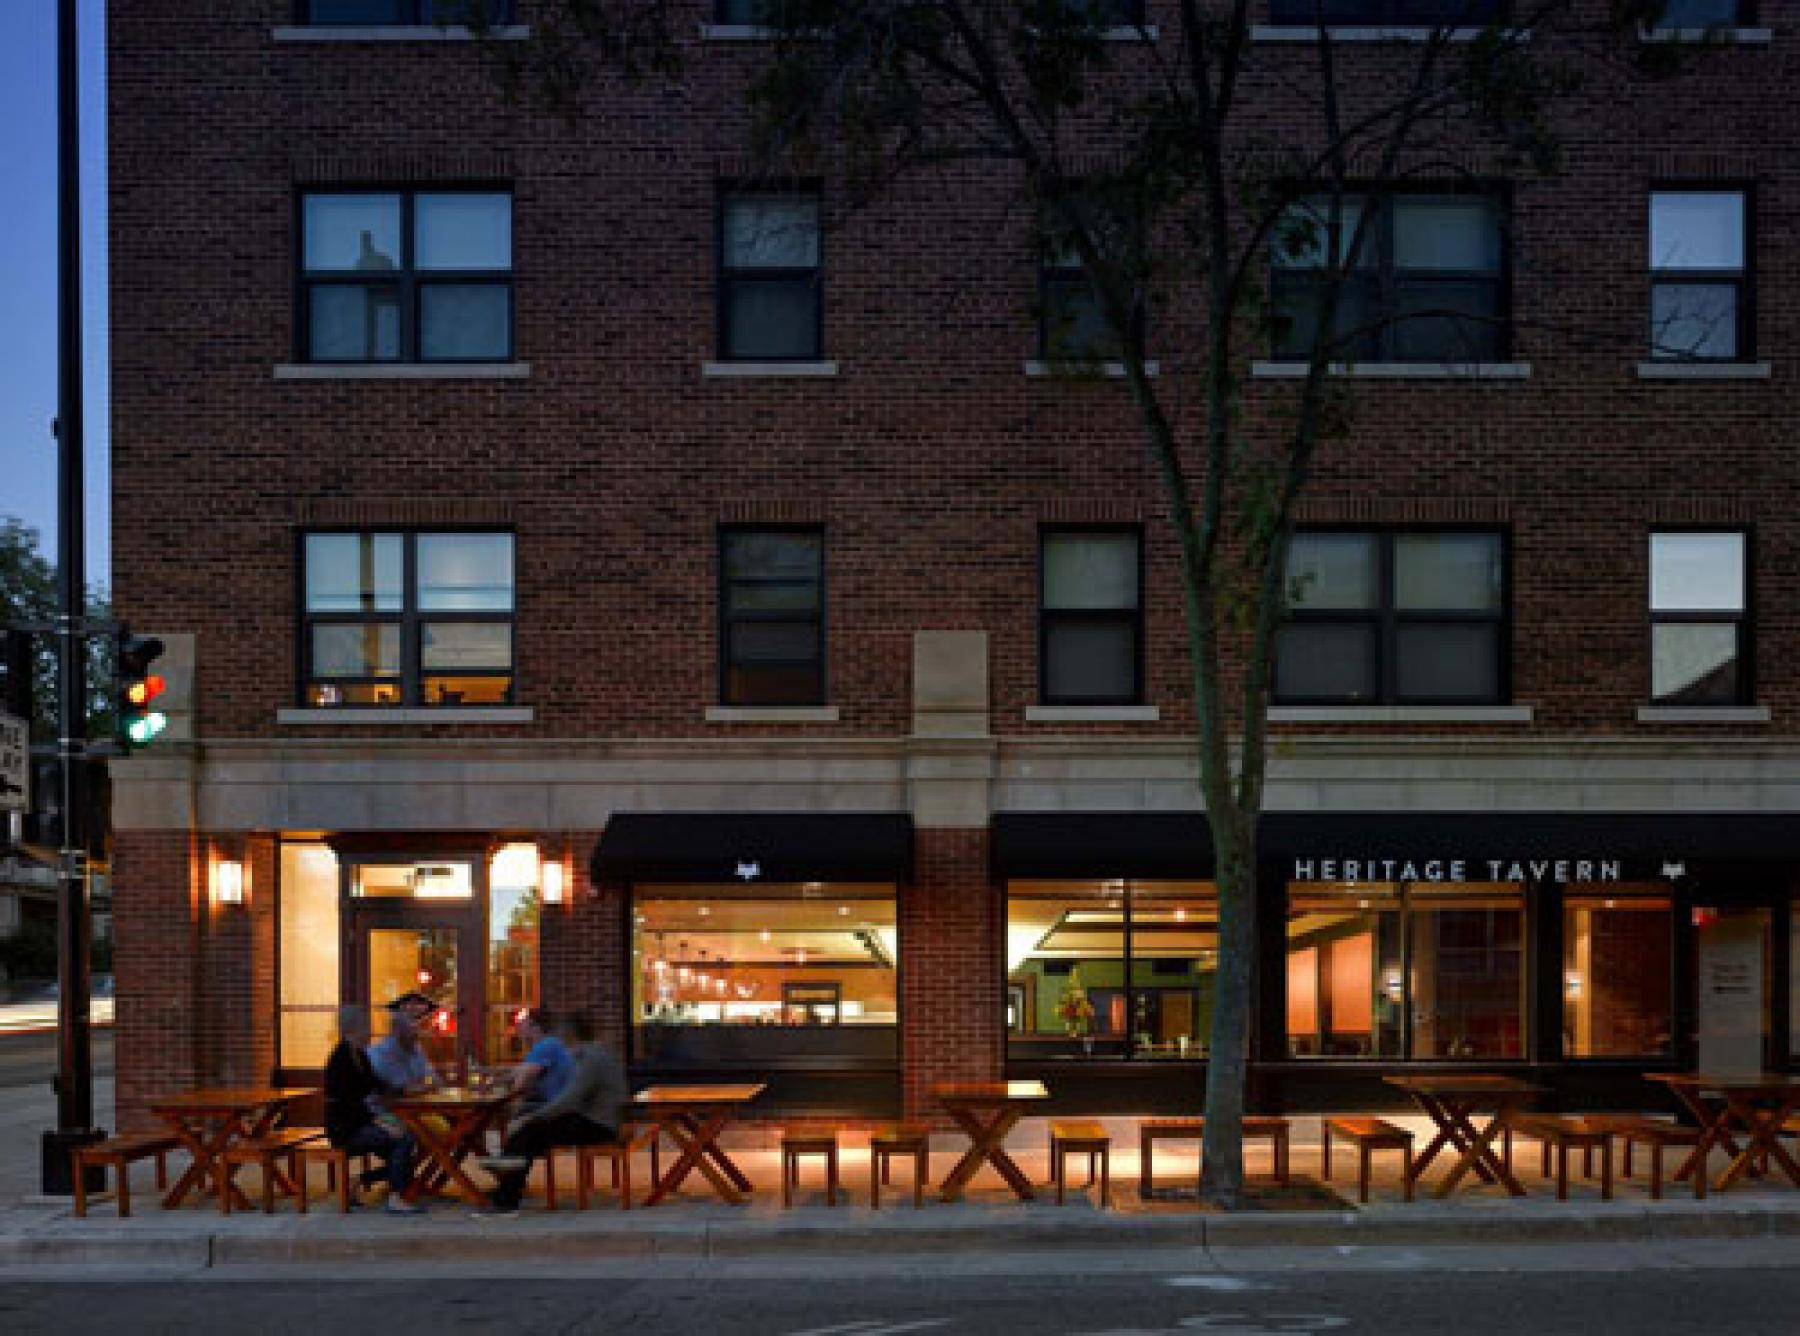 ULI Capitol Hill and Heritage Tavern